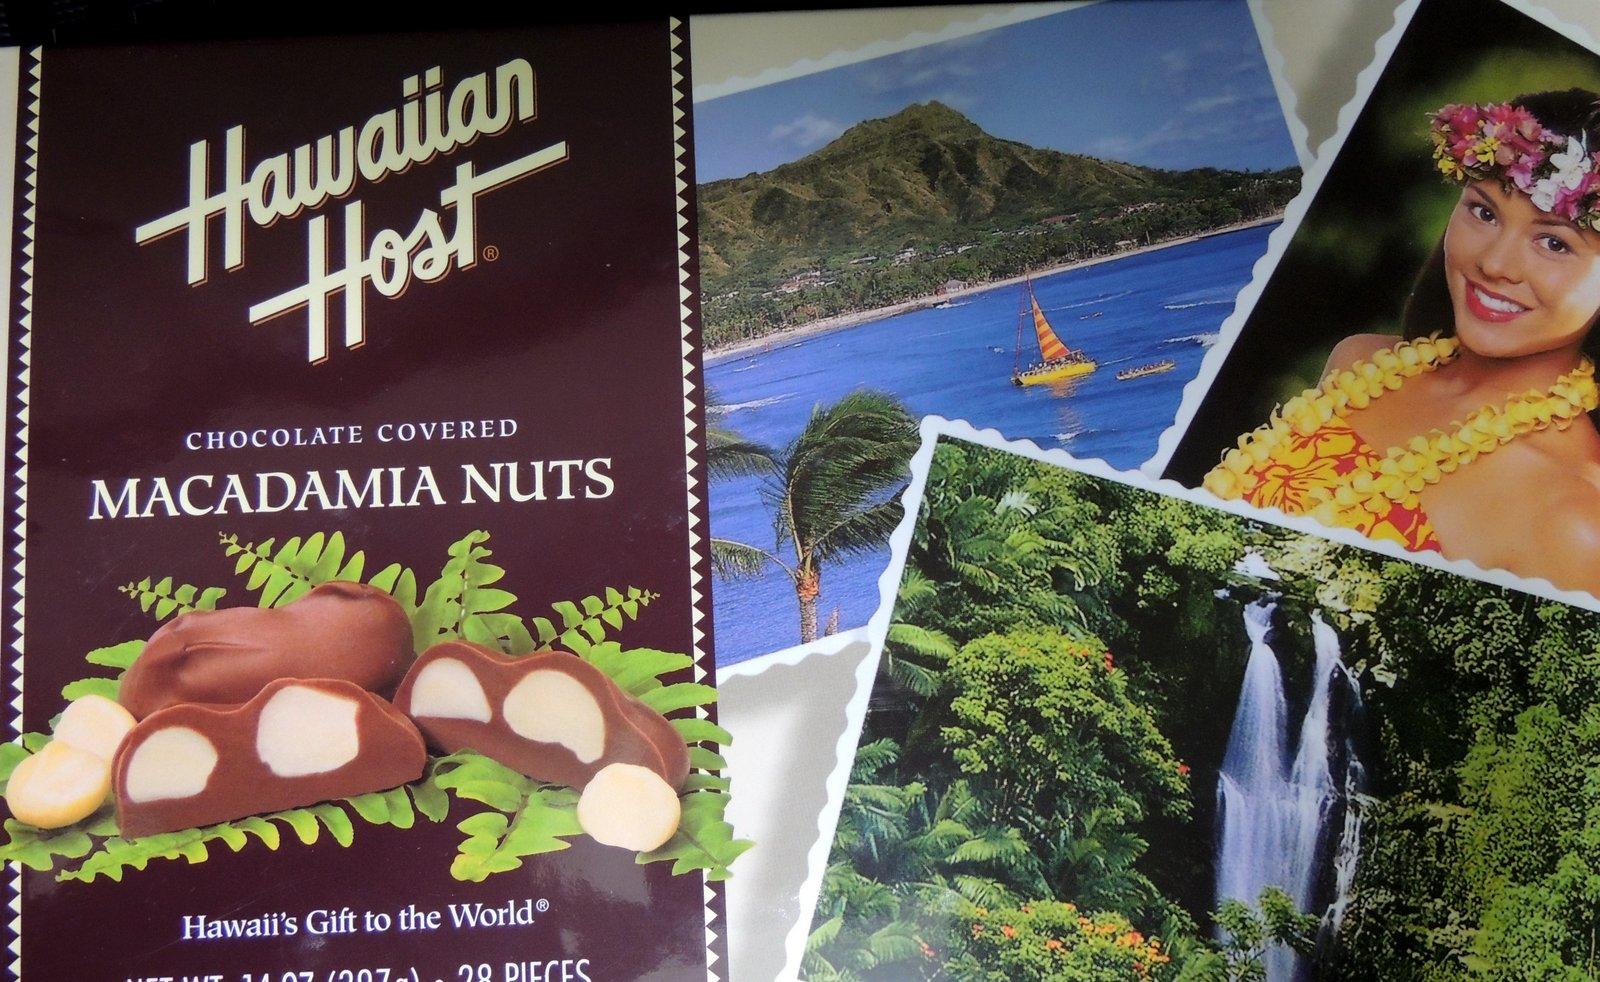 Hawaii Macadamia Nuts Choclate